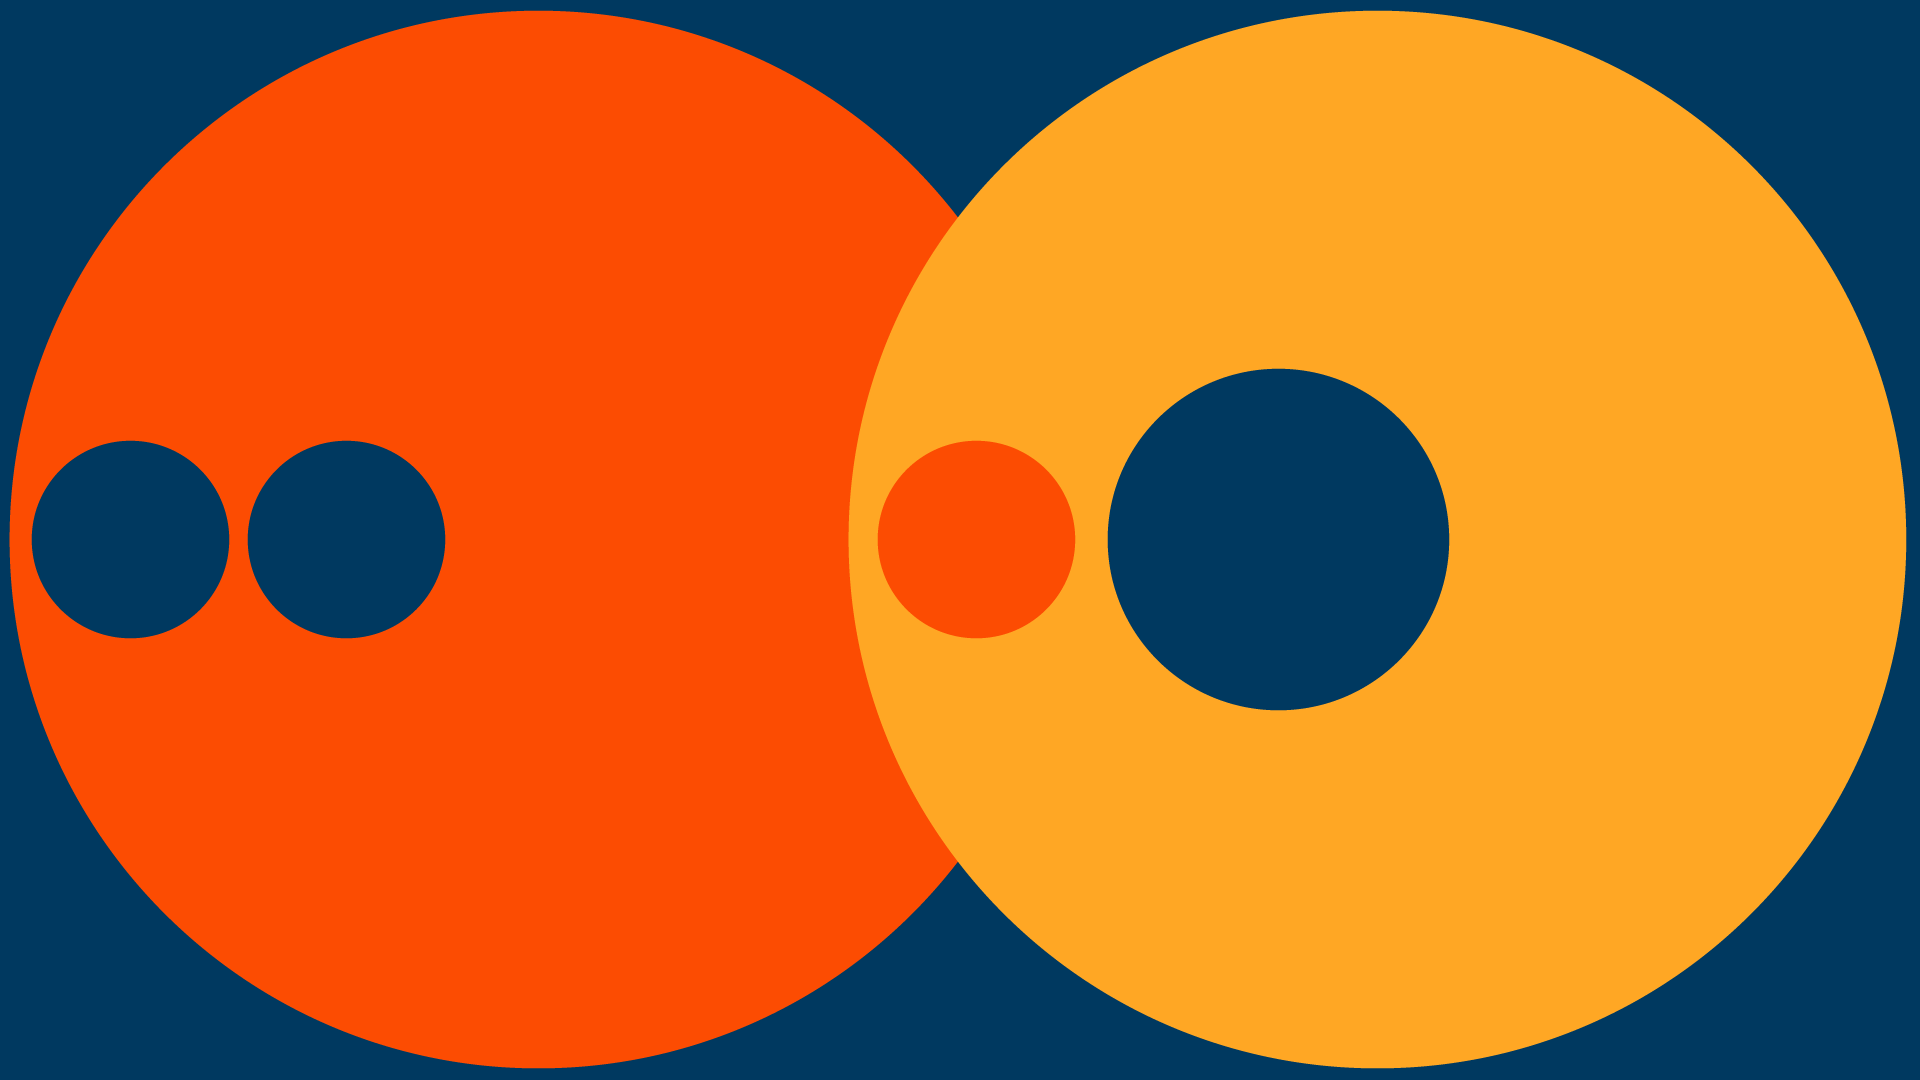 Circles_Design.png